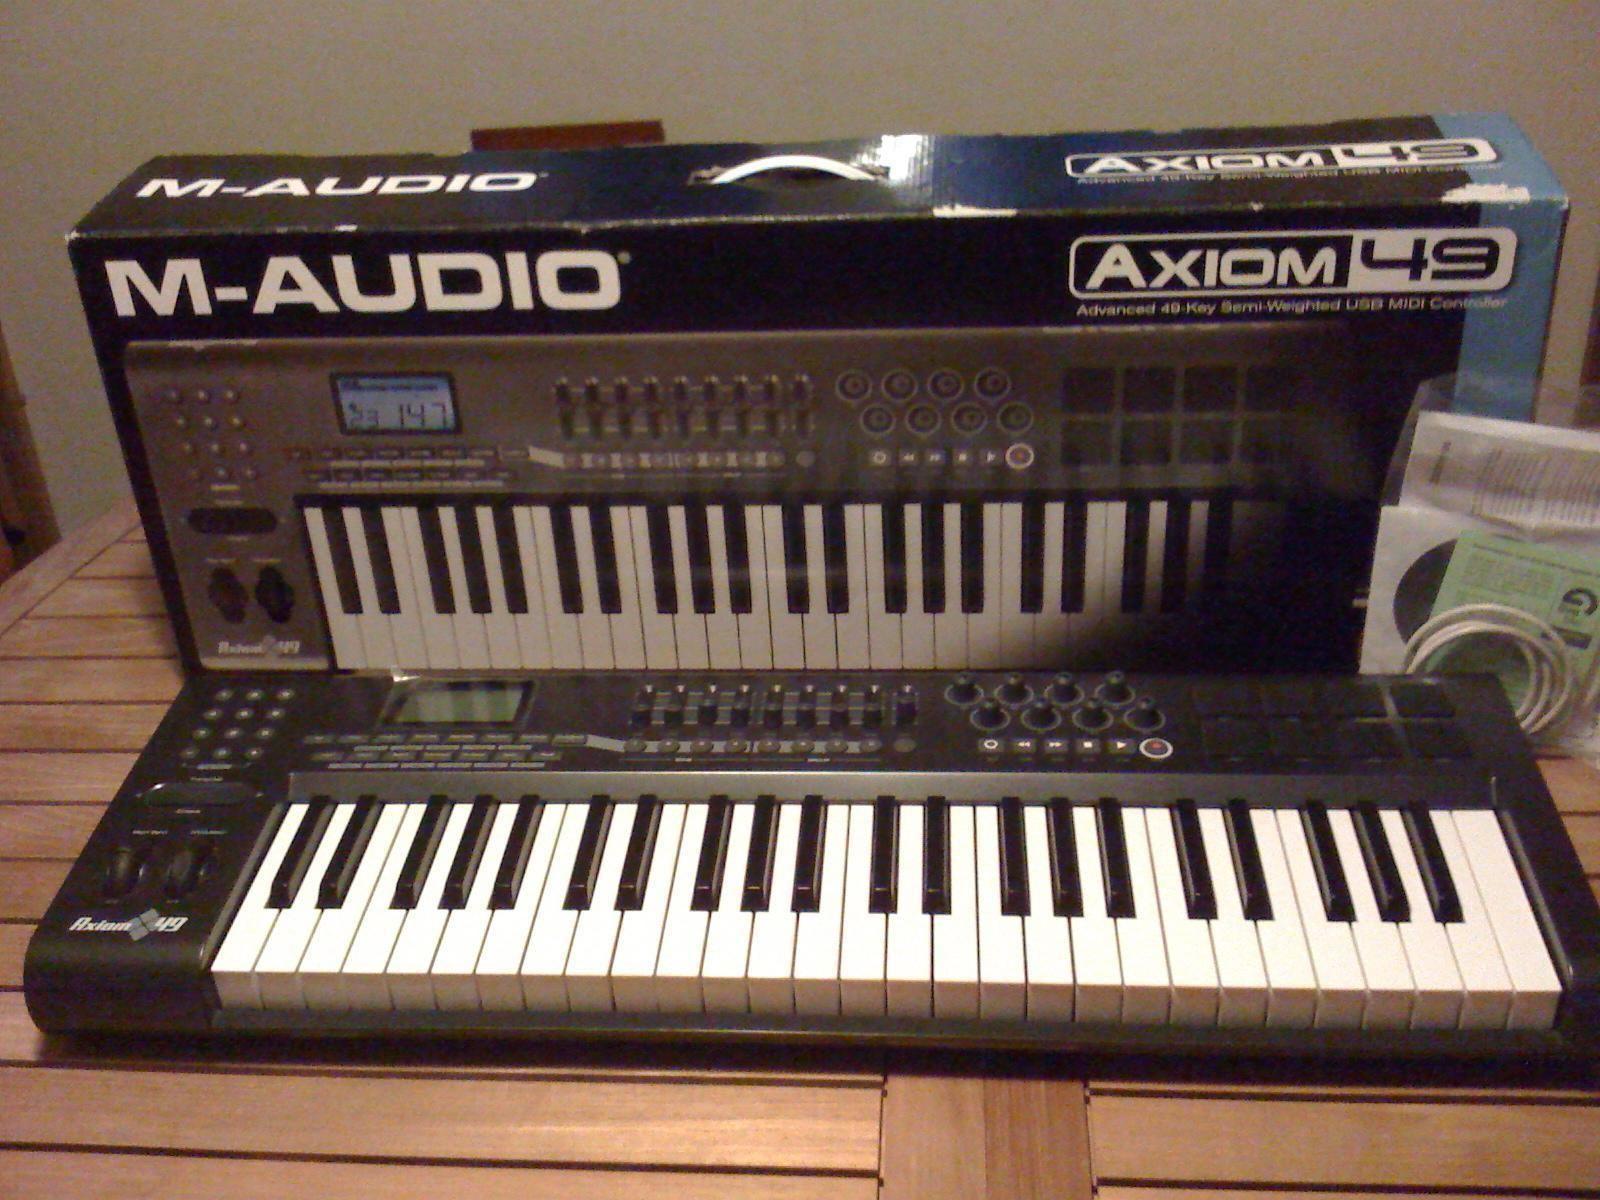 M-audio Axiom Pro 49 Driver Download